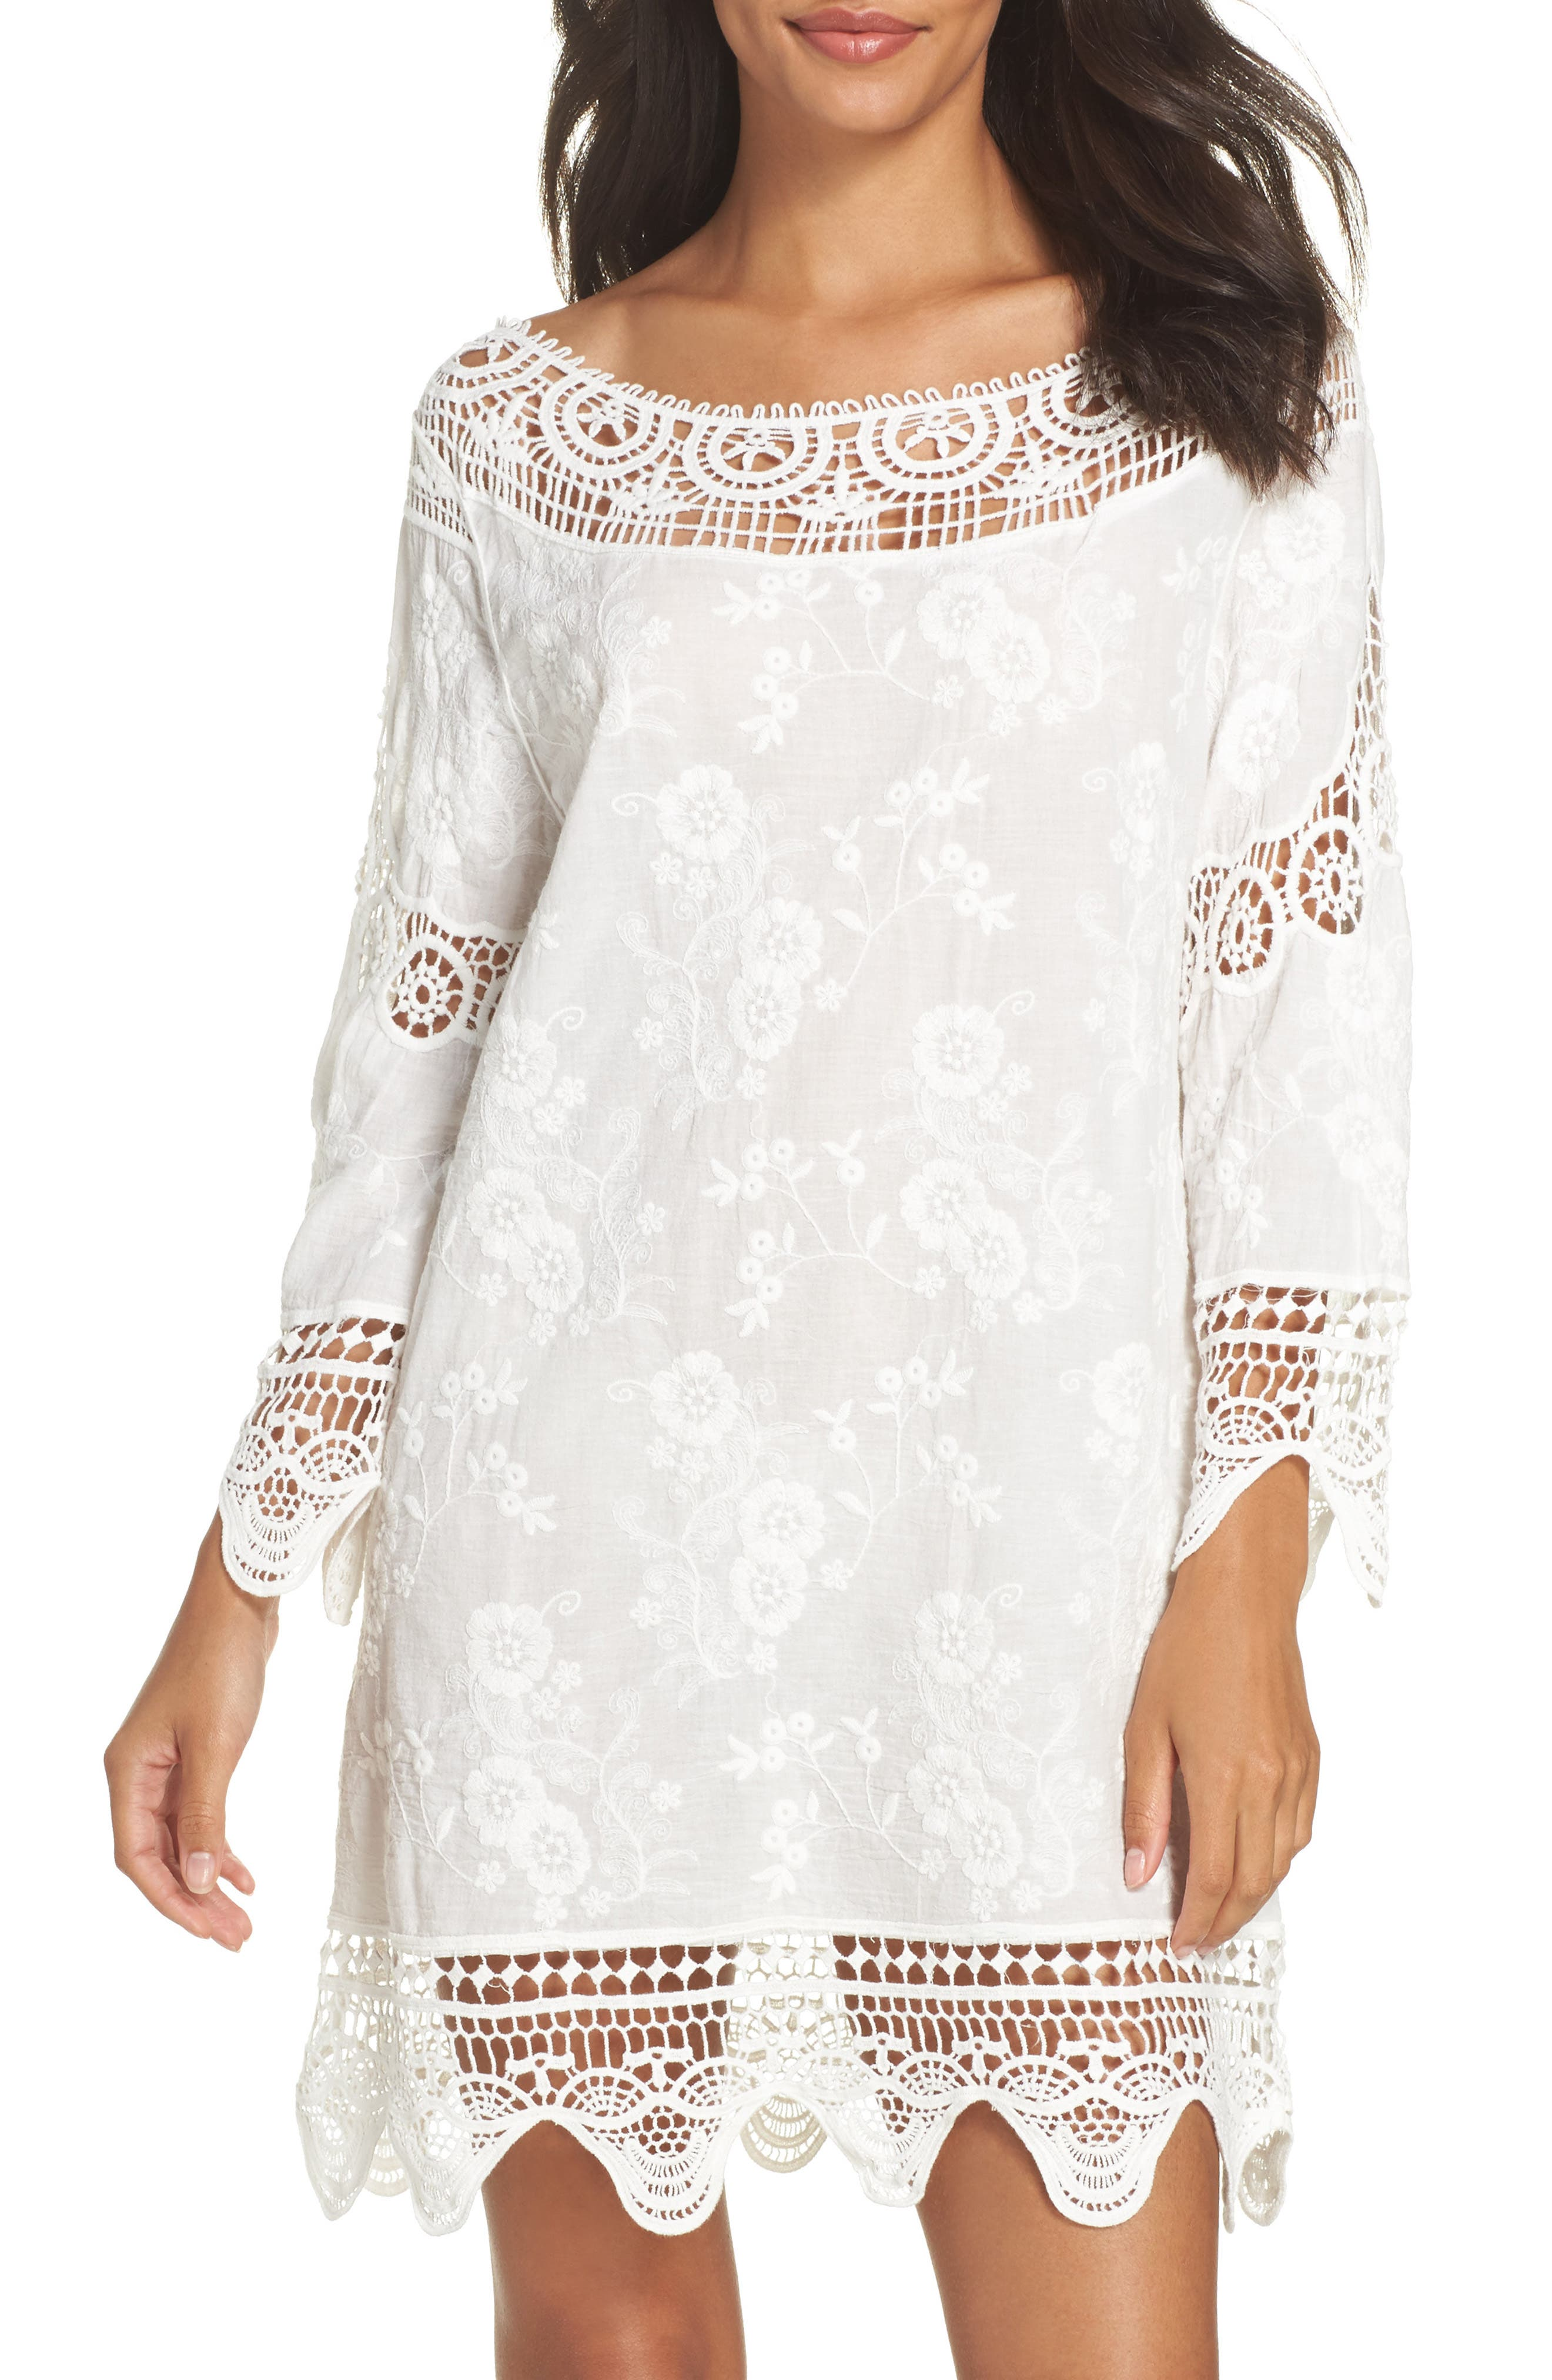 Zen Garden Cover-Up Dress,                             Main thumbnail 1, color,                             White